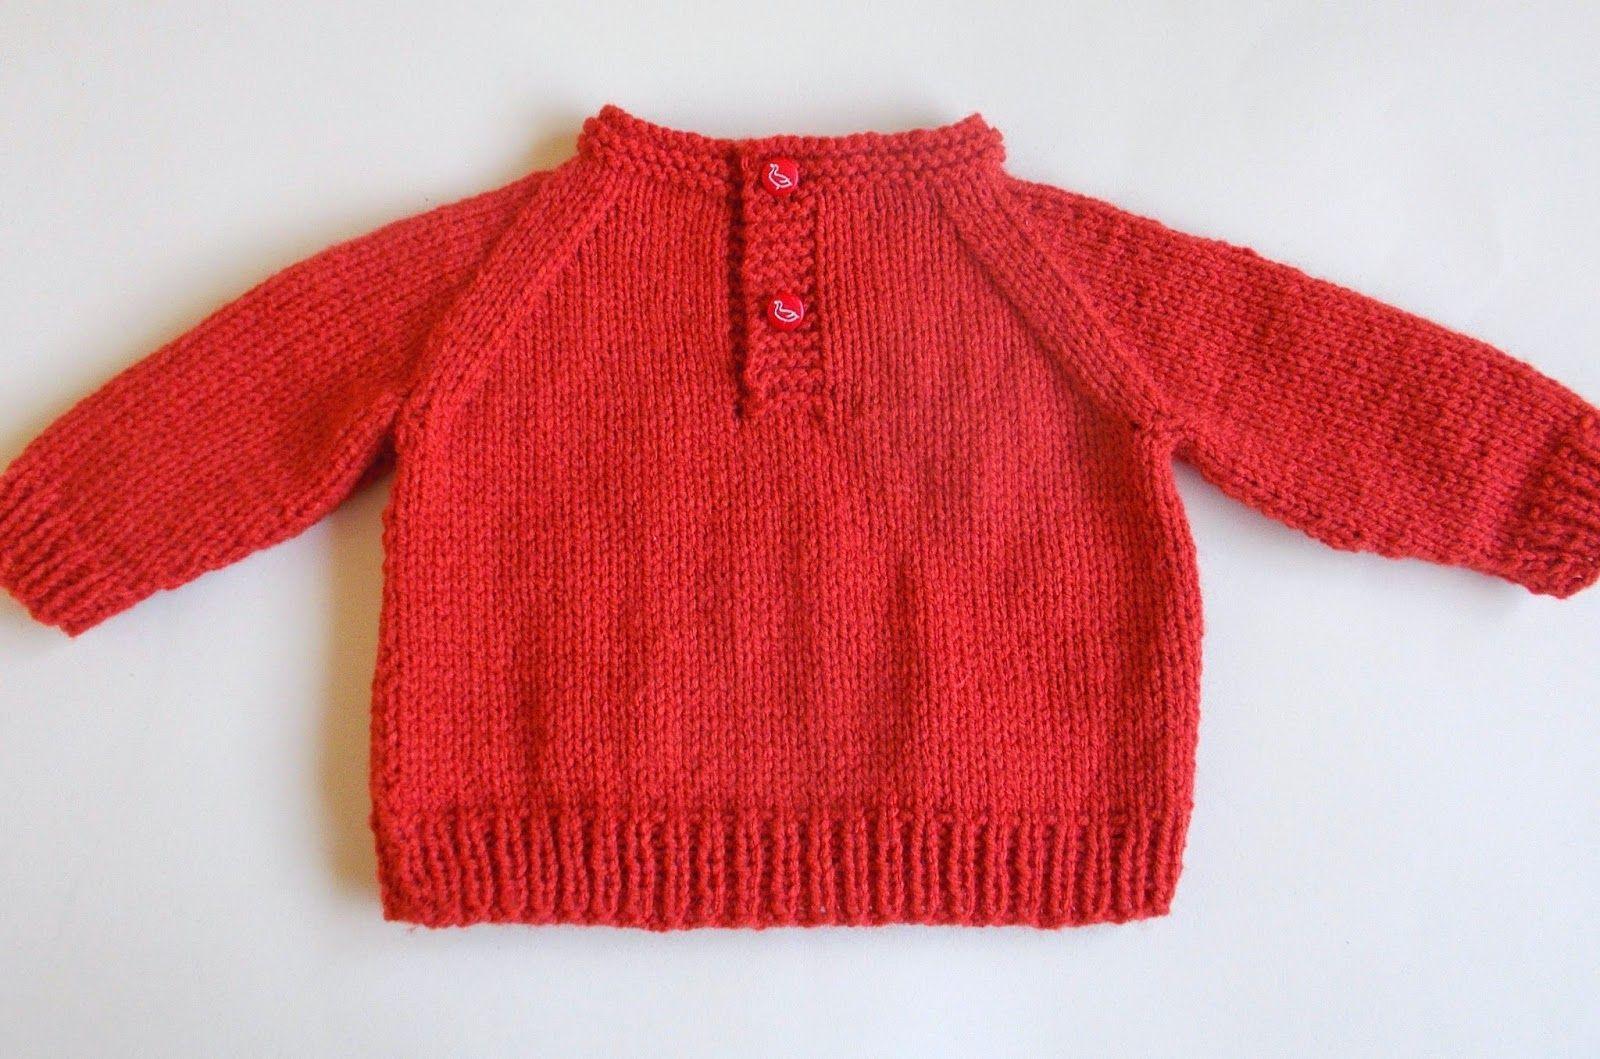 marianna\'s+lazy+daisy+days:+RUBEN+Baby+Boy+Sweater | Baby/Child ...